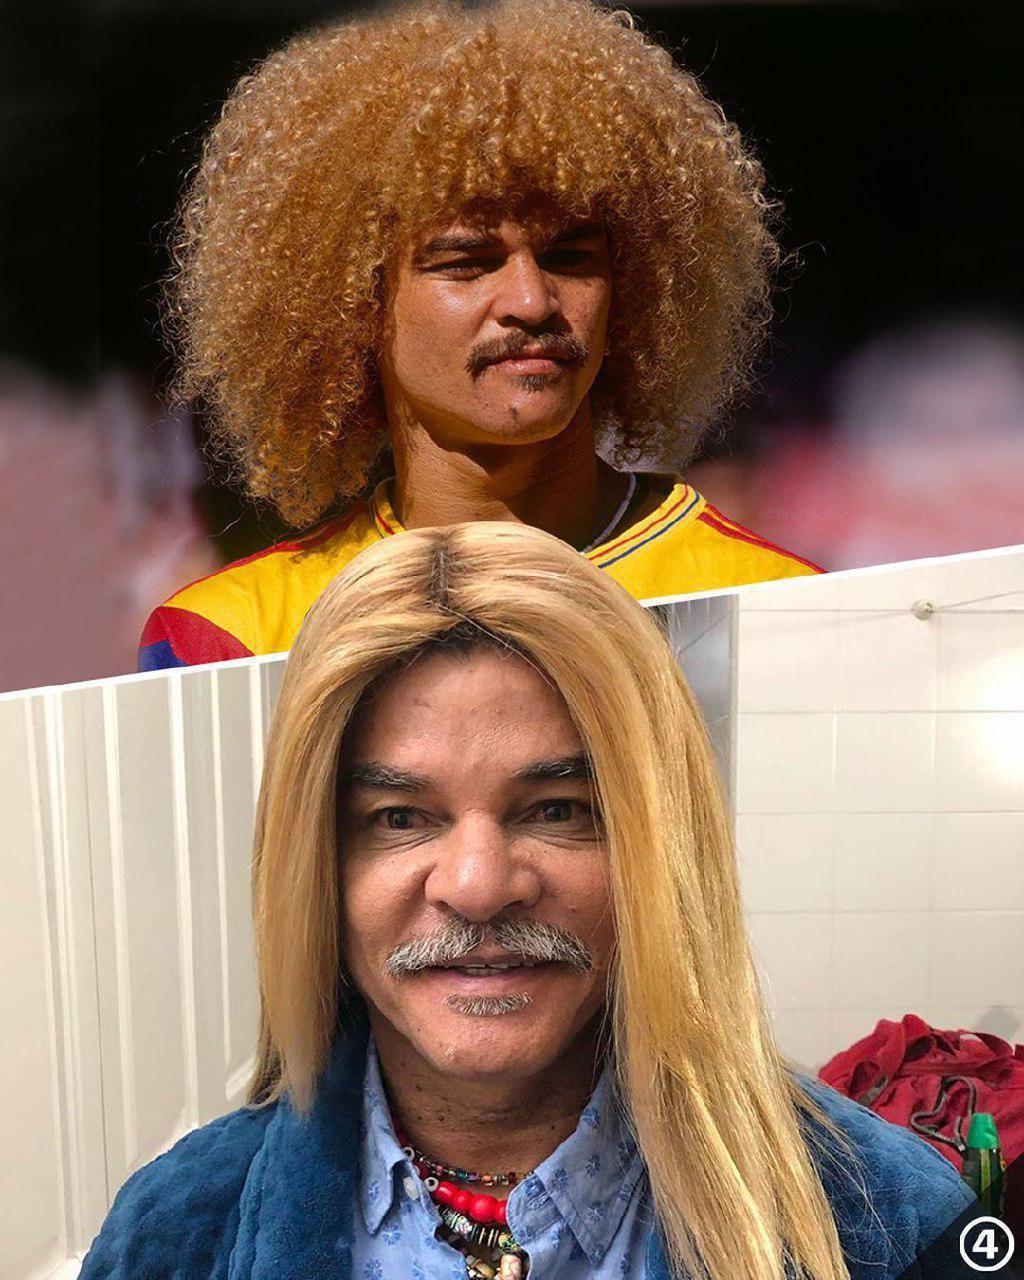 مدل موی عجیب و غریب ستاره کلمبیایی + عکس